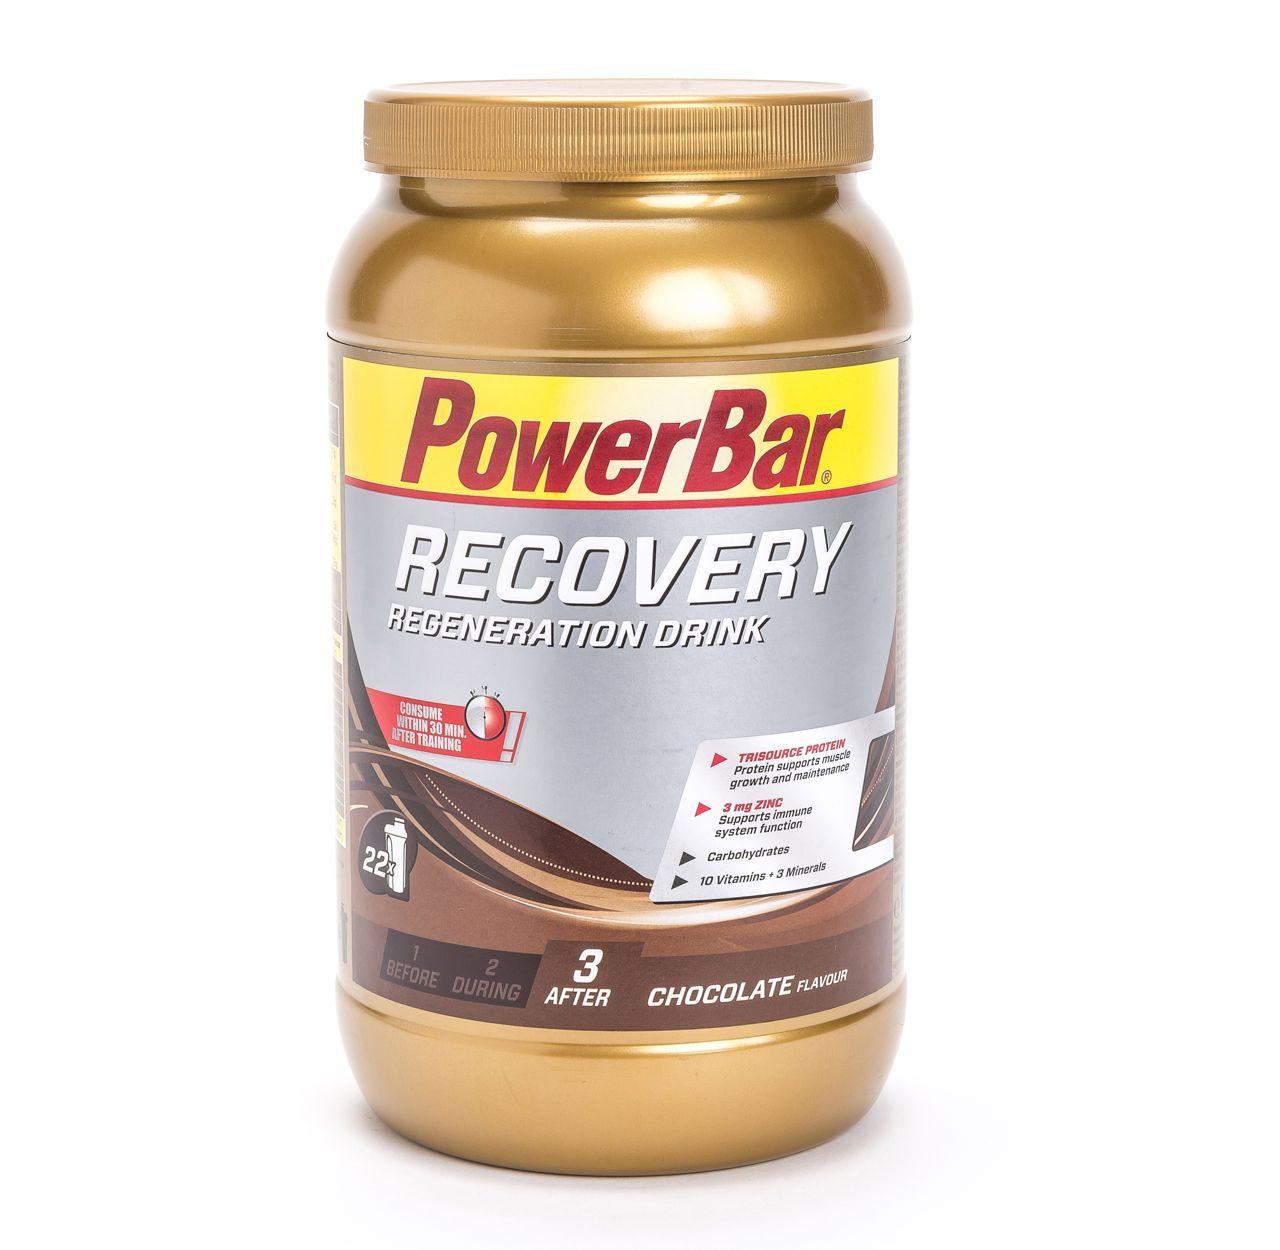 Powerbar Recovery Regeneration